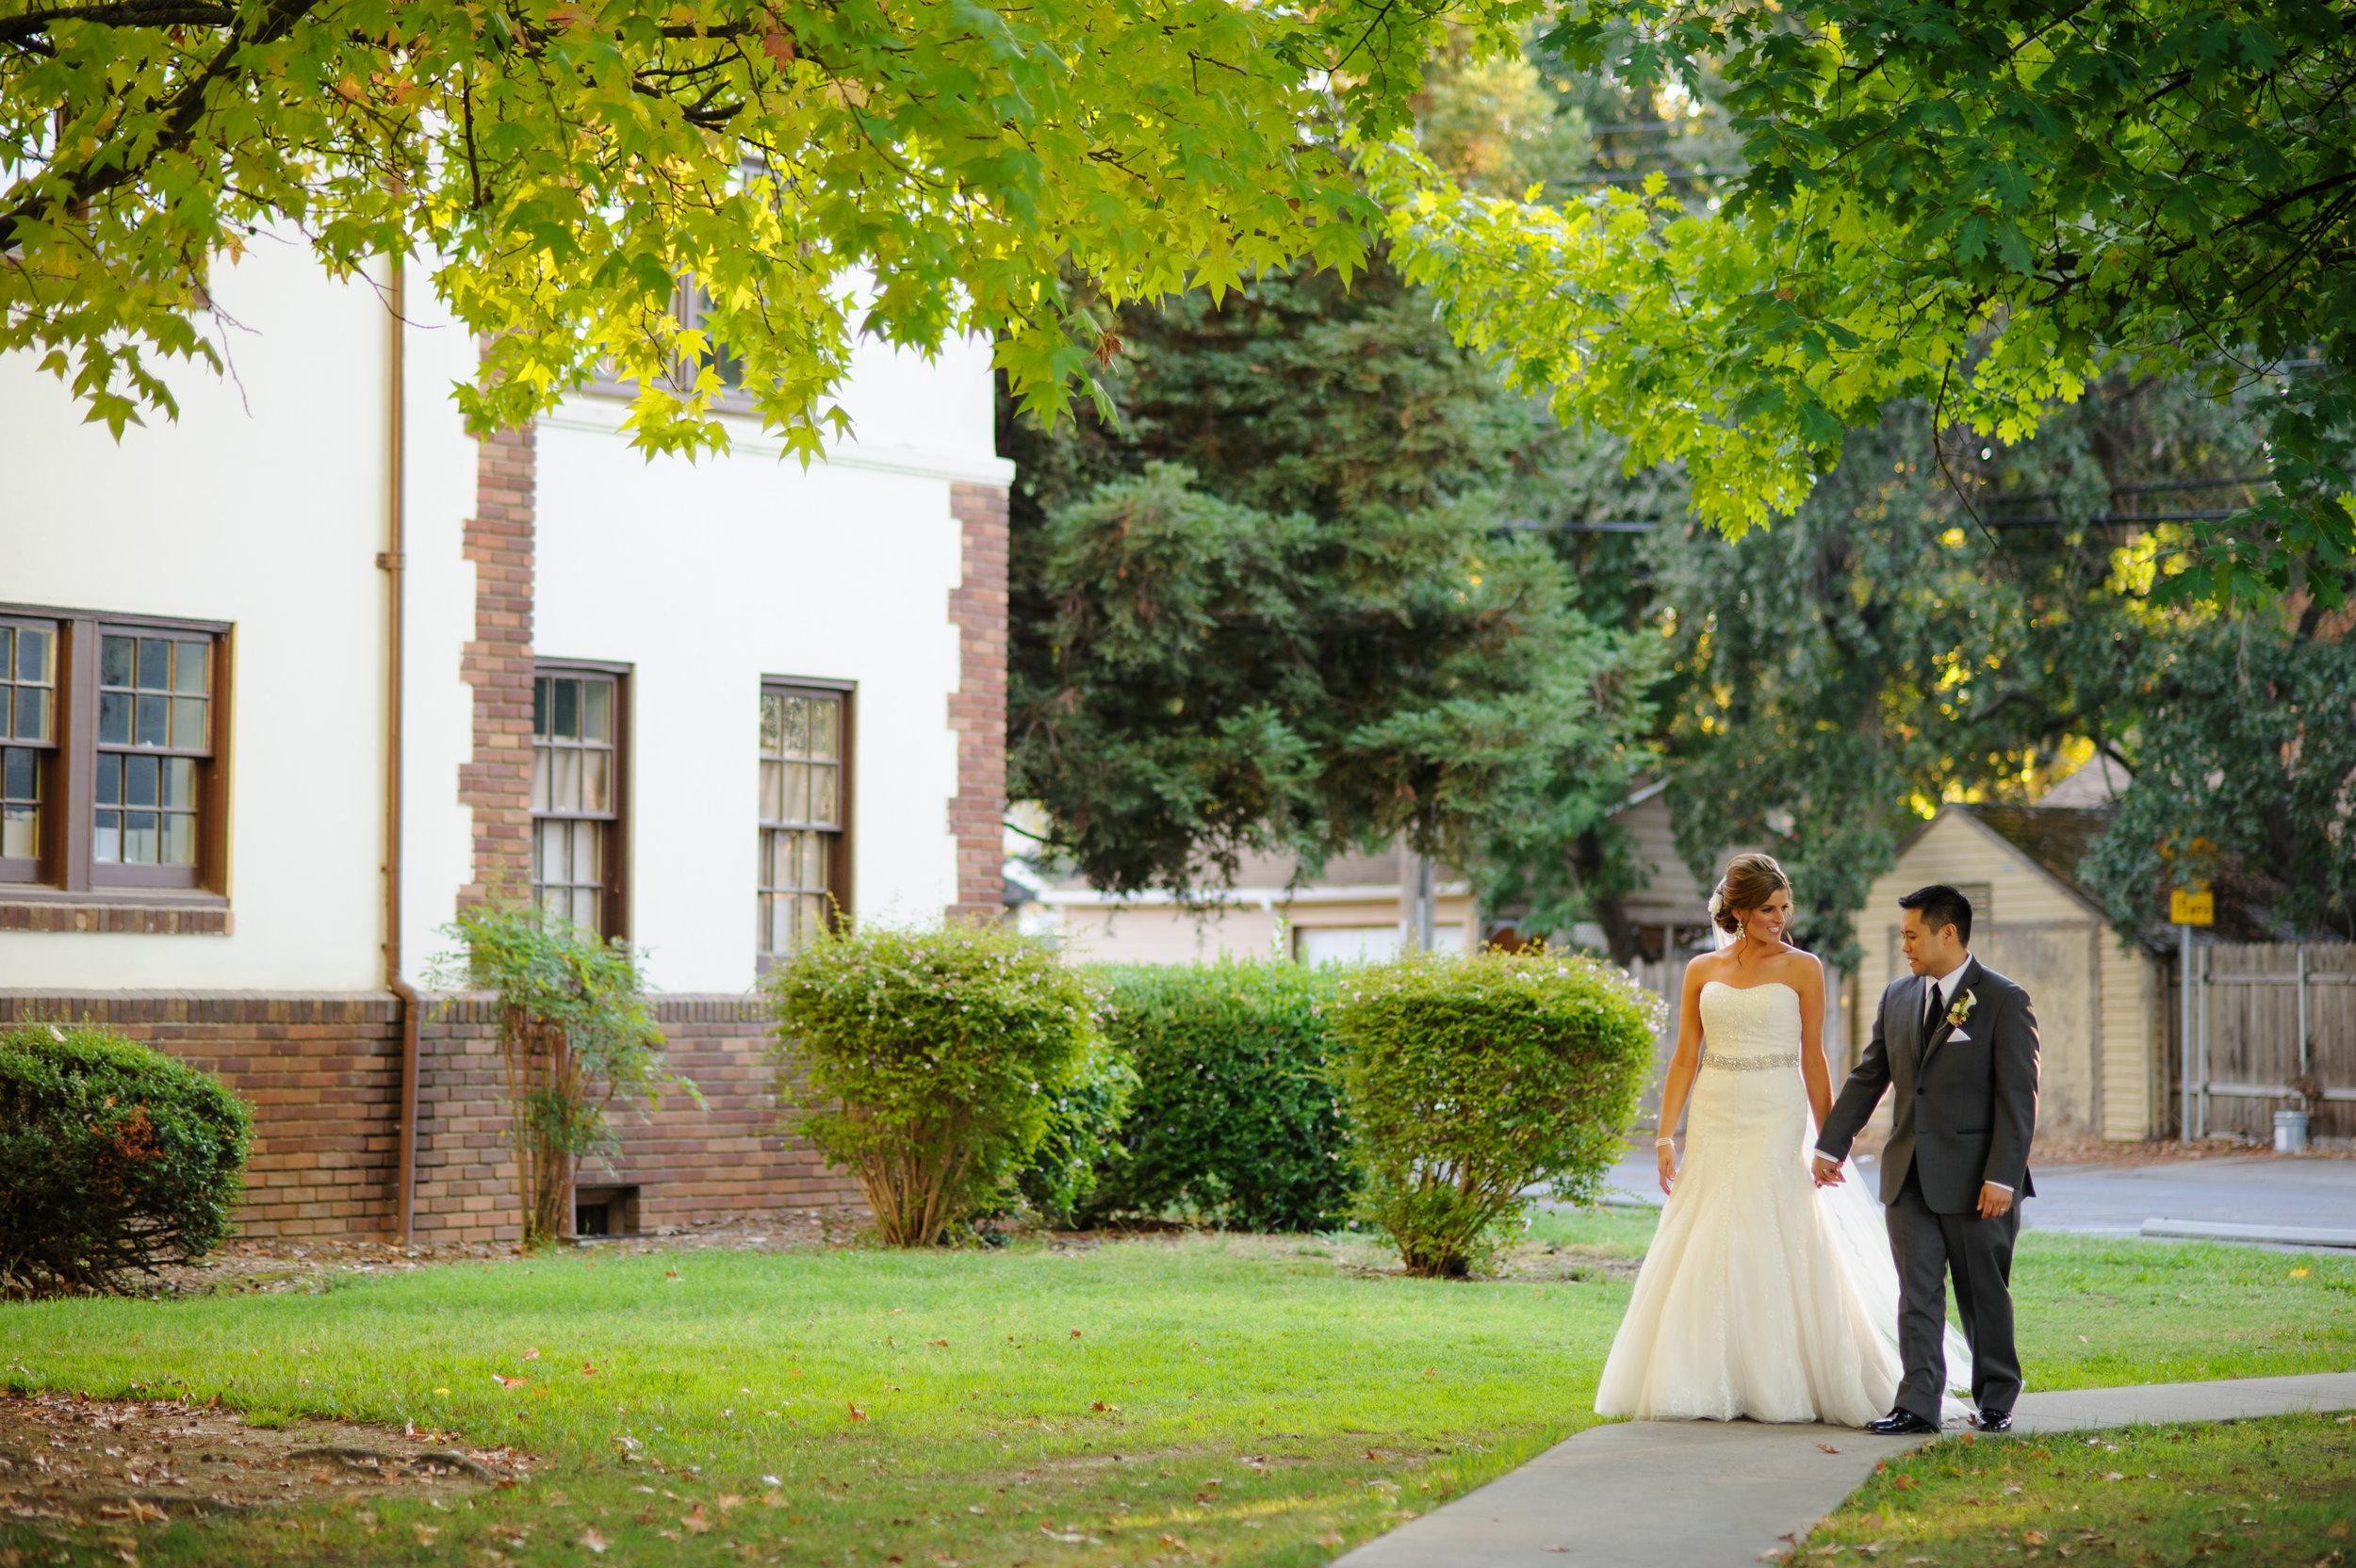 susan-brad-022-sacramento-wedding-photographer-katherine-nicole-photography.JPG